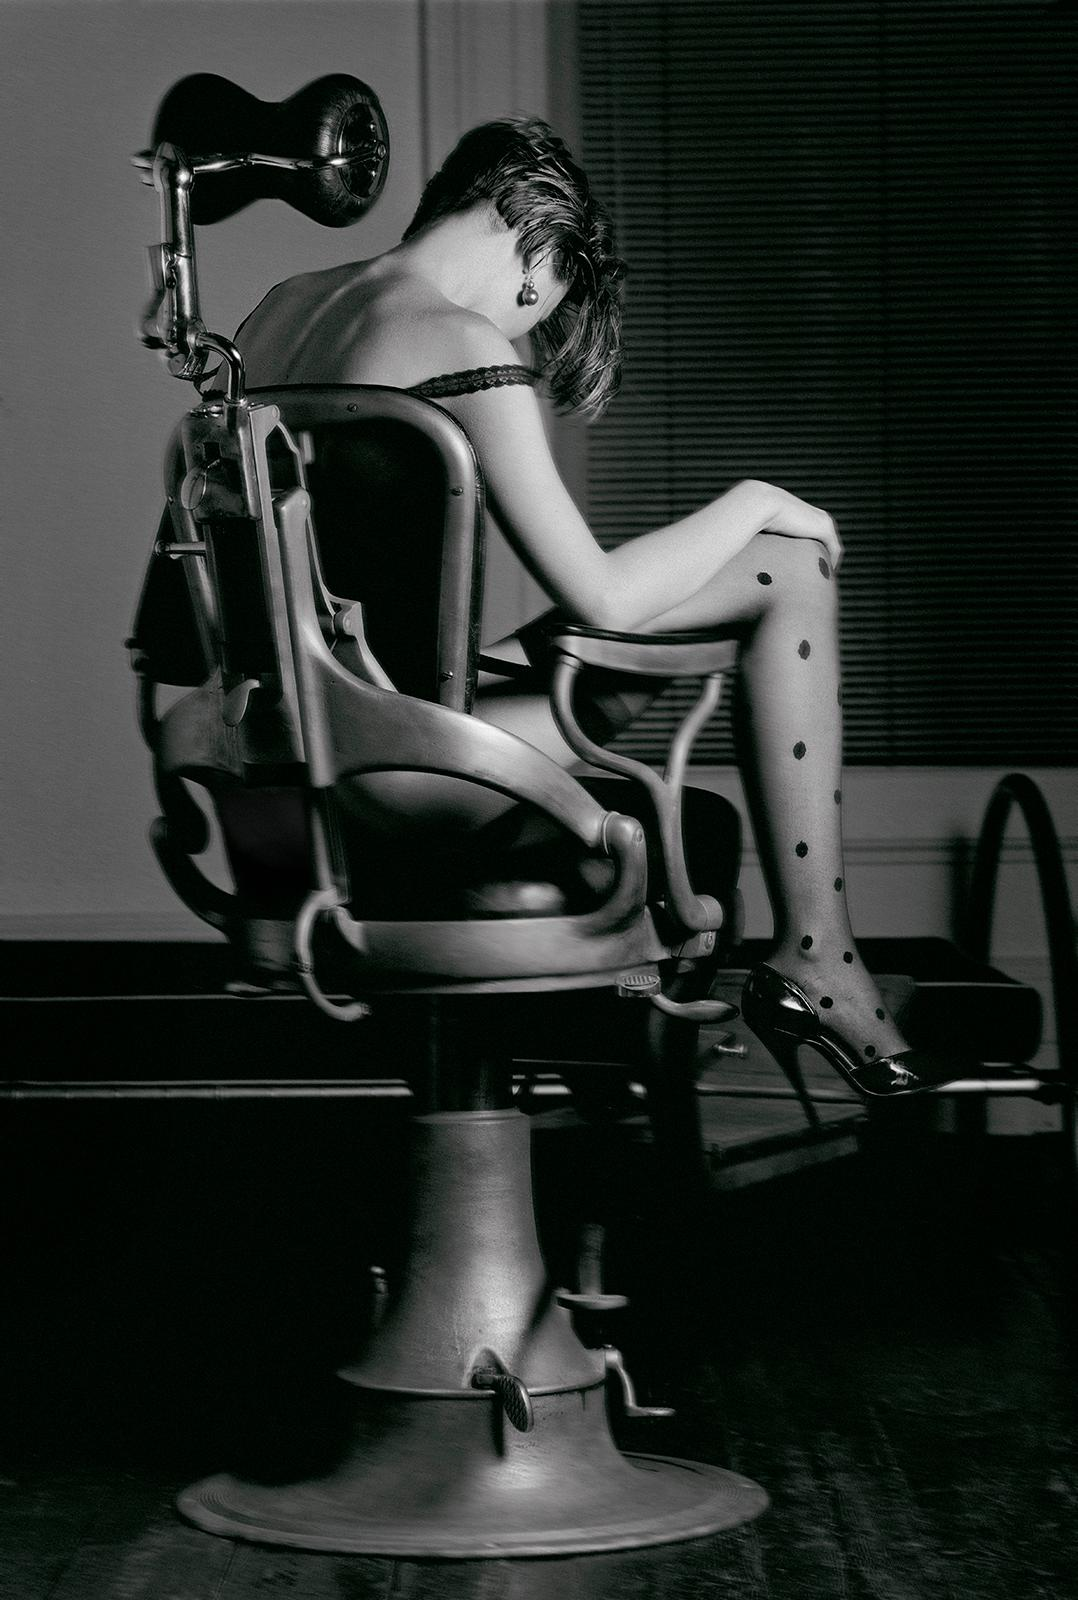 Francesca -Signed limited edition fine art print,Black and white photo,Analog